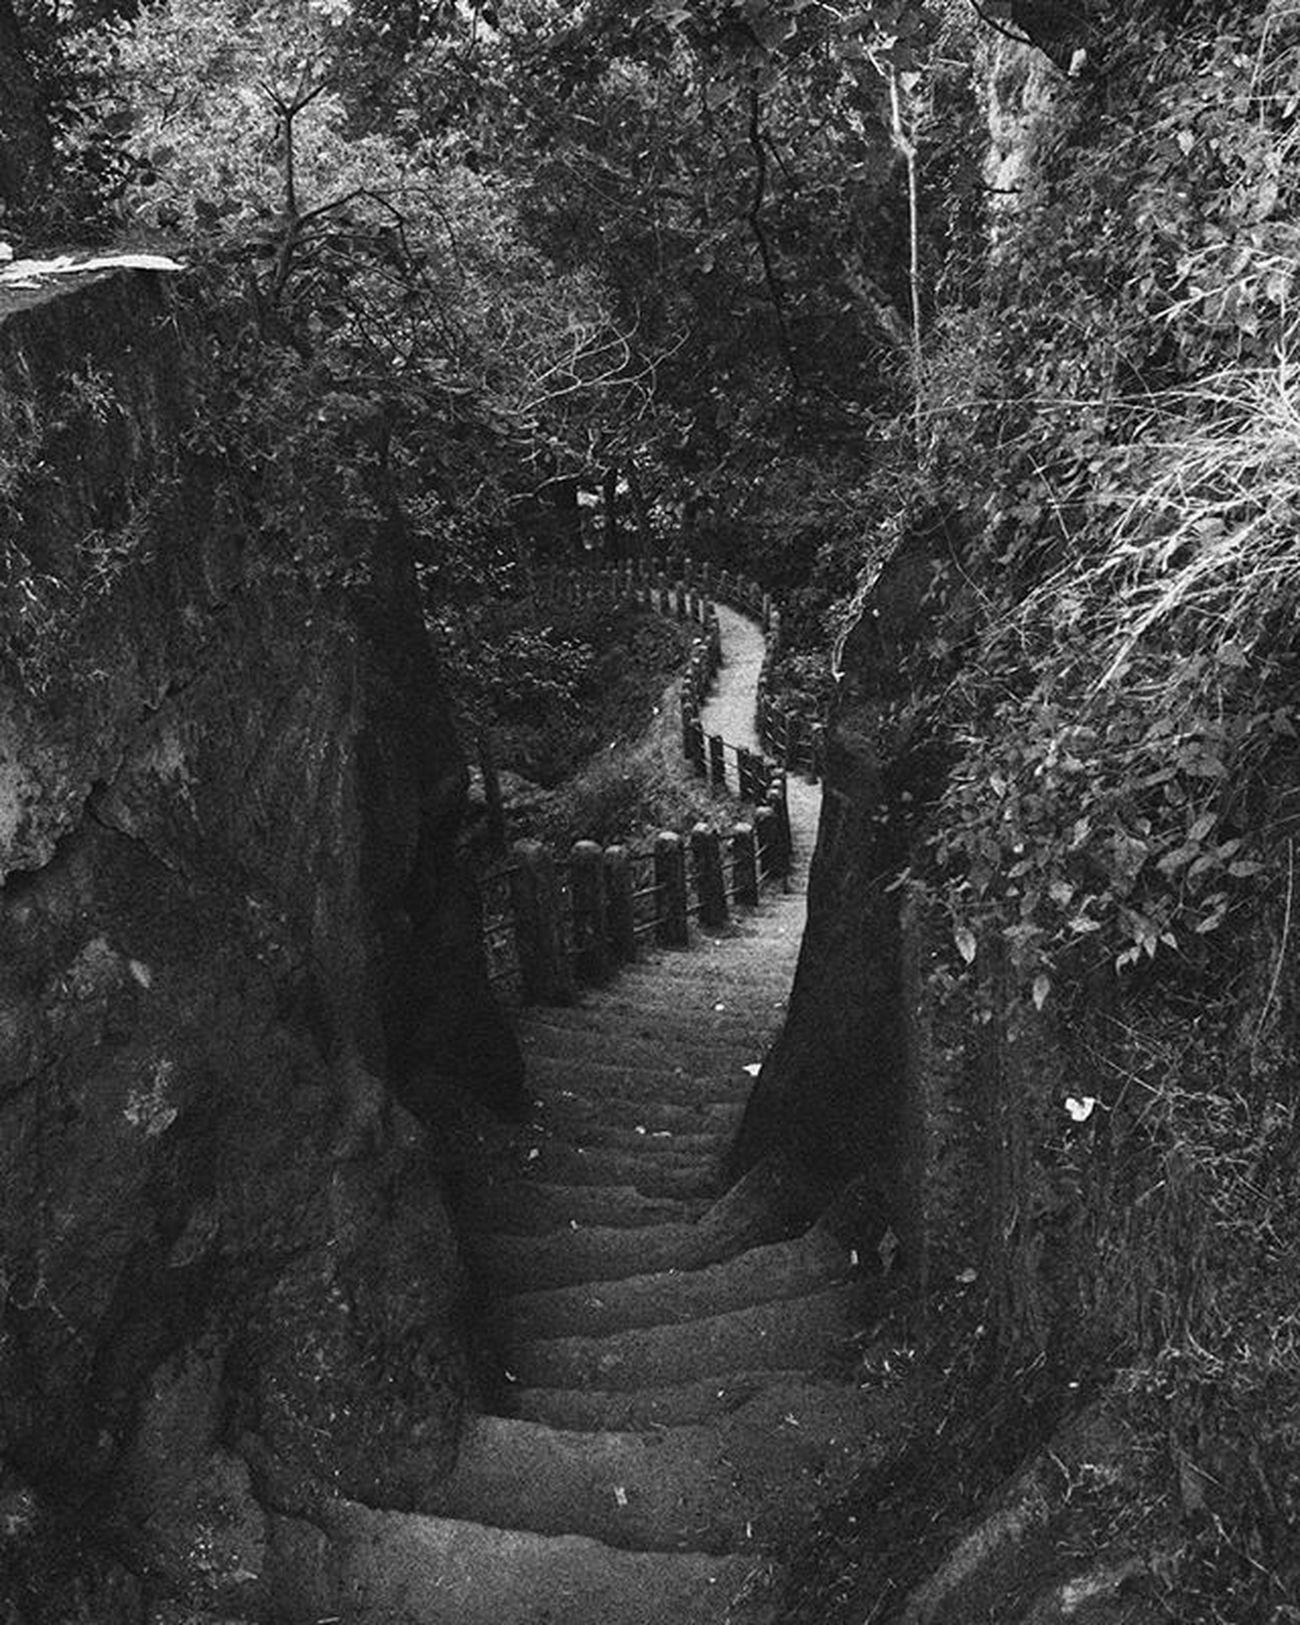 2014 Throwback Mainpat Bnw Monochrome Grayscale Bnwlovers Bnw_society Bnw_captures Stairs India Noir Bnw_life Bnw_demand Canonphotography Canon_photos 1200D Wide Blackandwhite NoEdits  Photographyislife Instadaily Photographybros